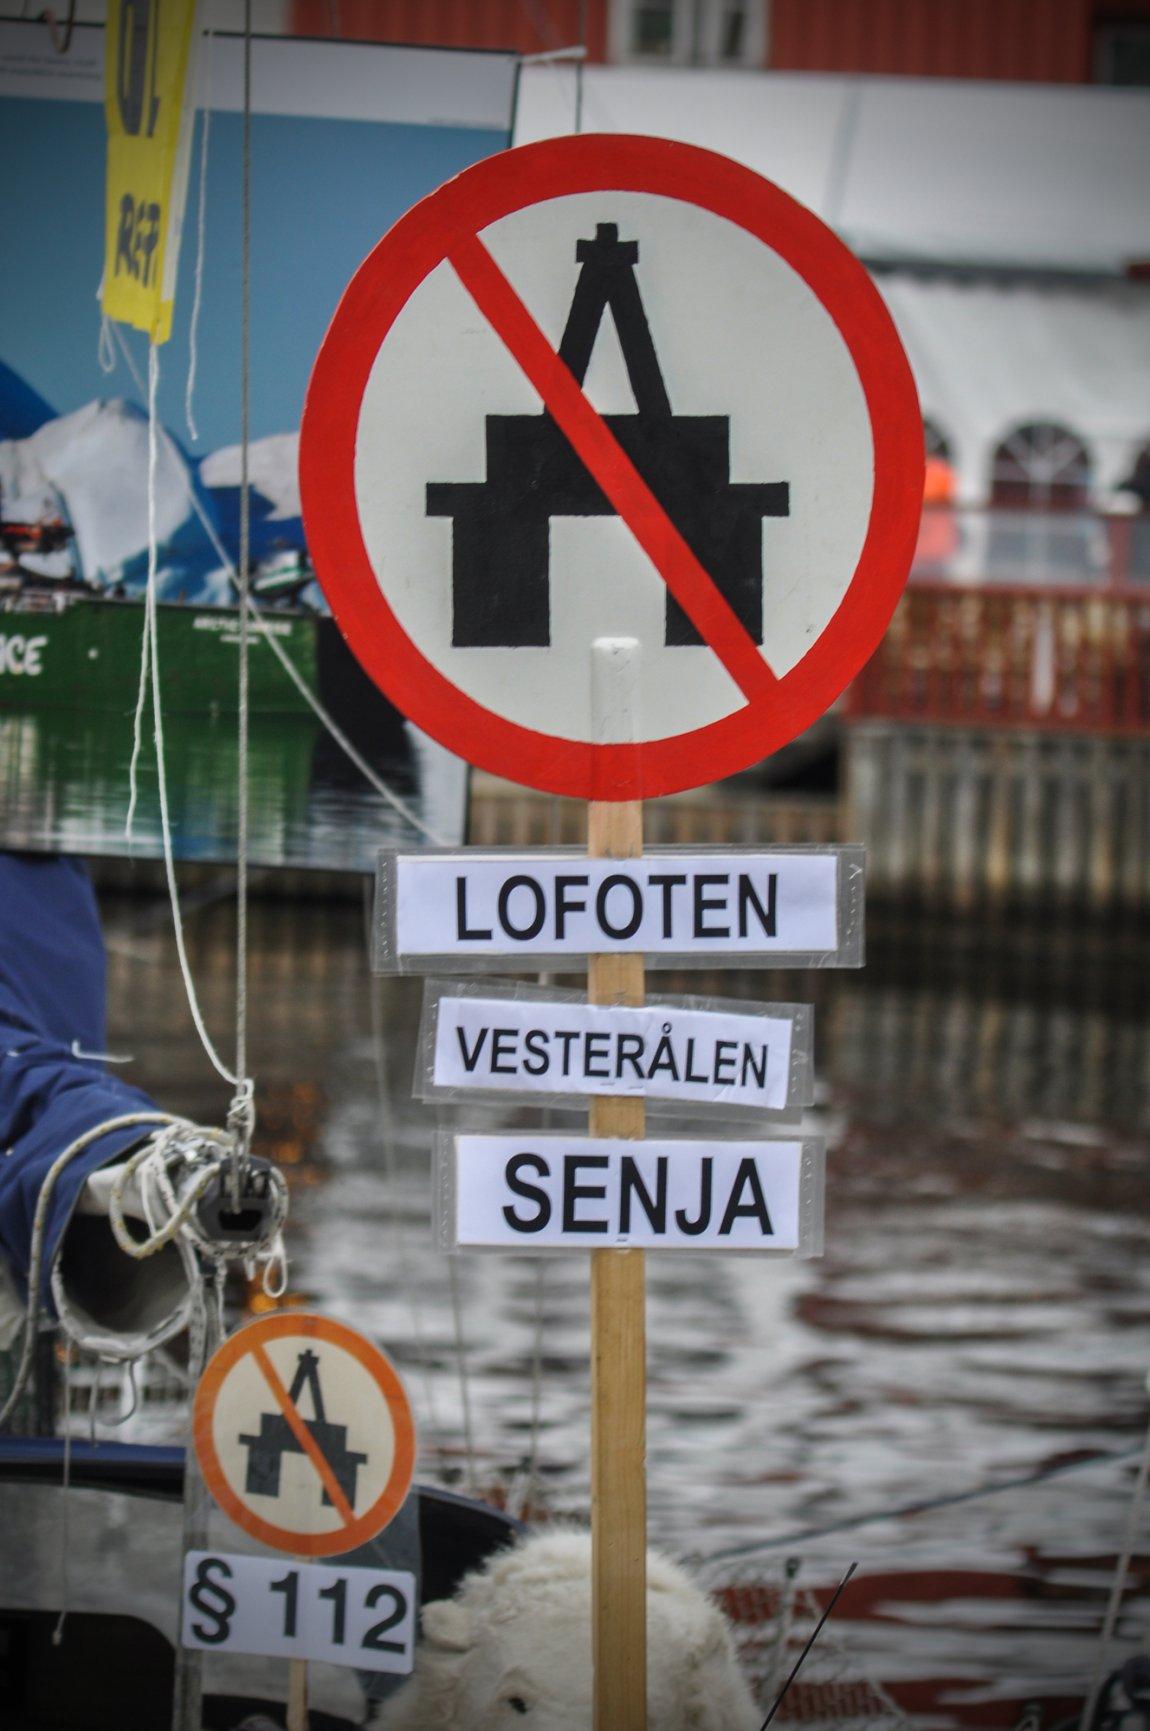 2017 - protest mot oljeboring, Arendsalsuka